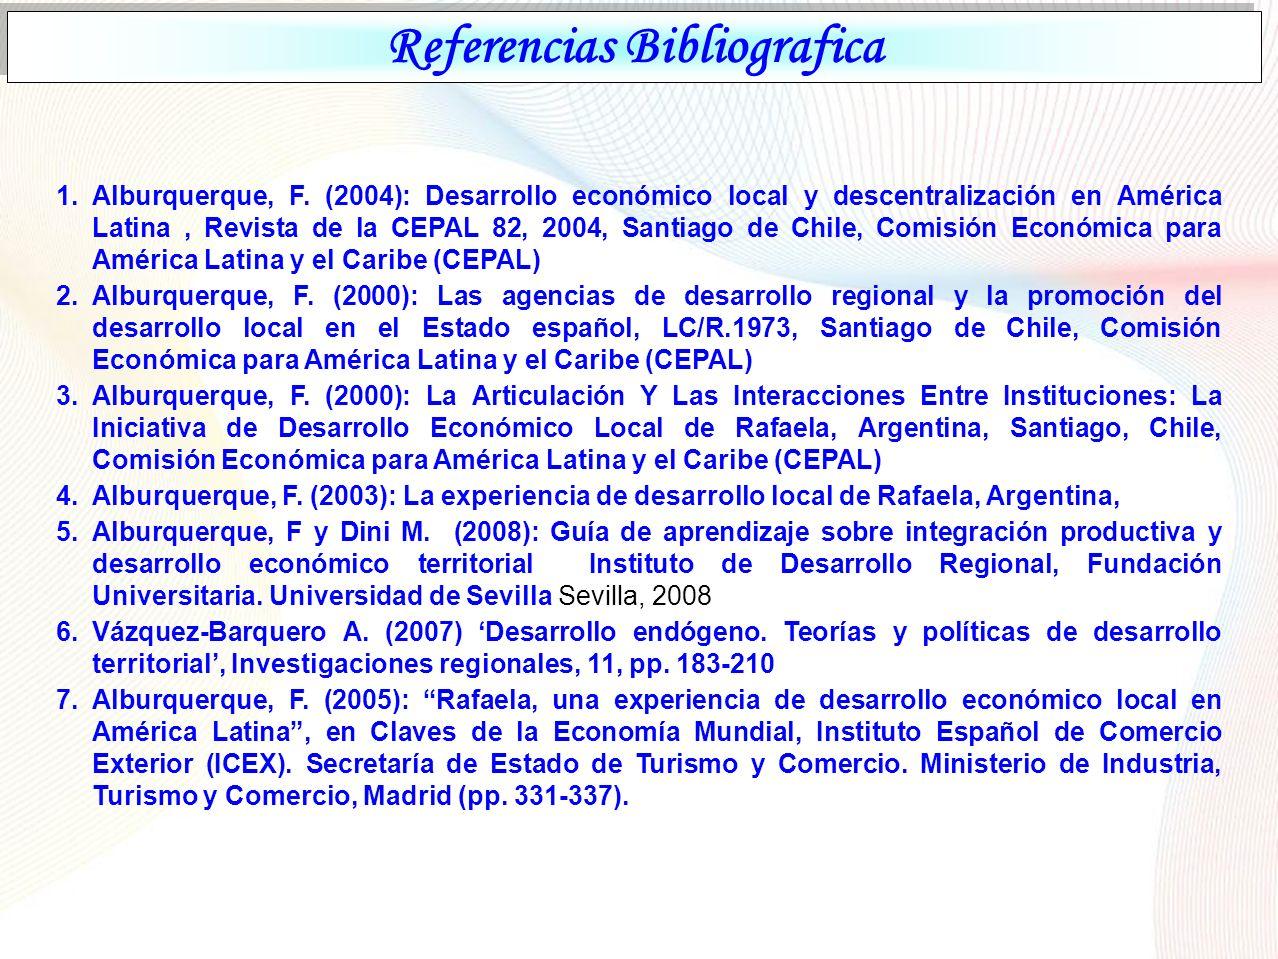 Referencias Bibliografica